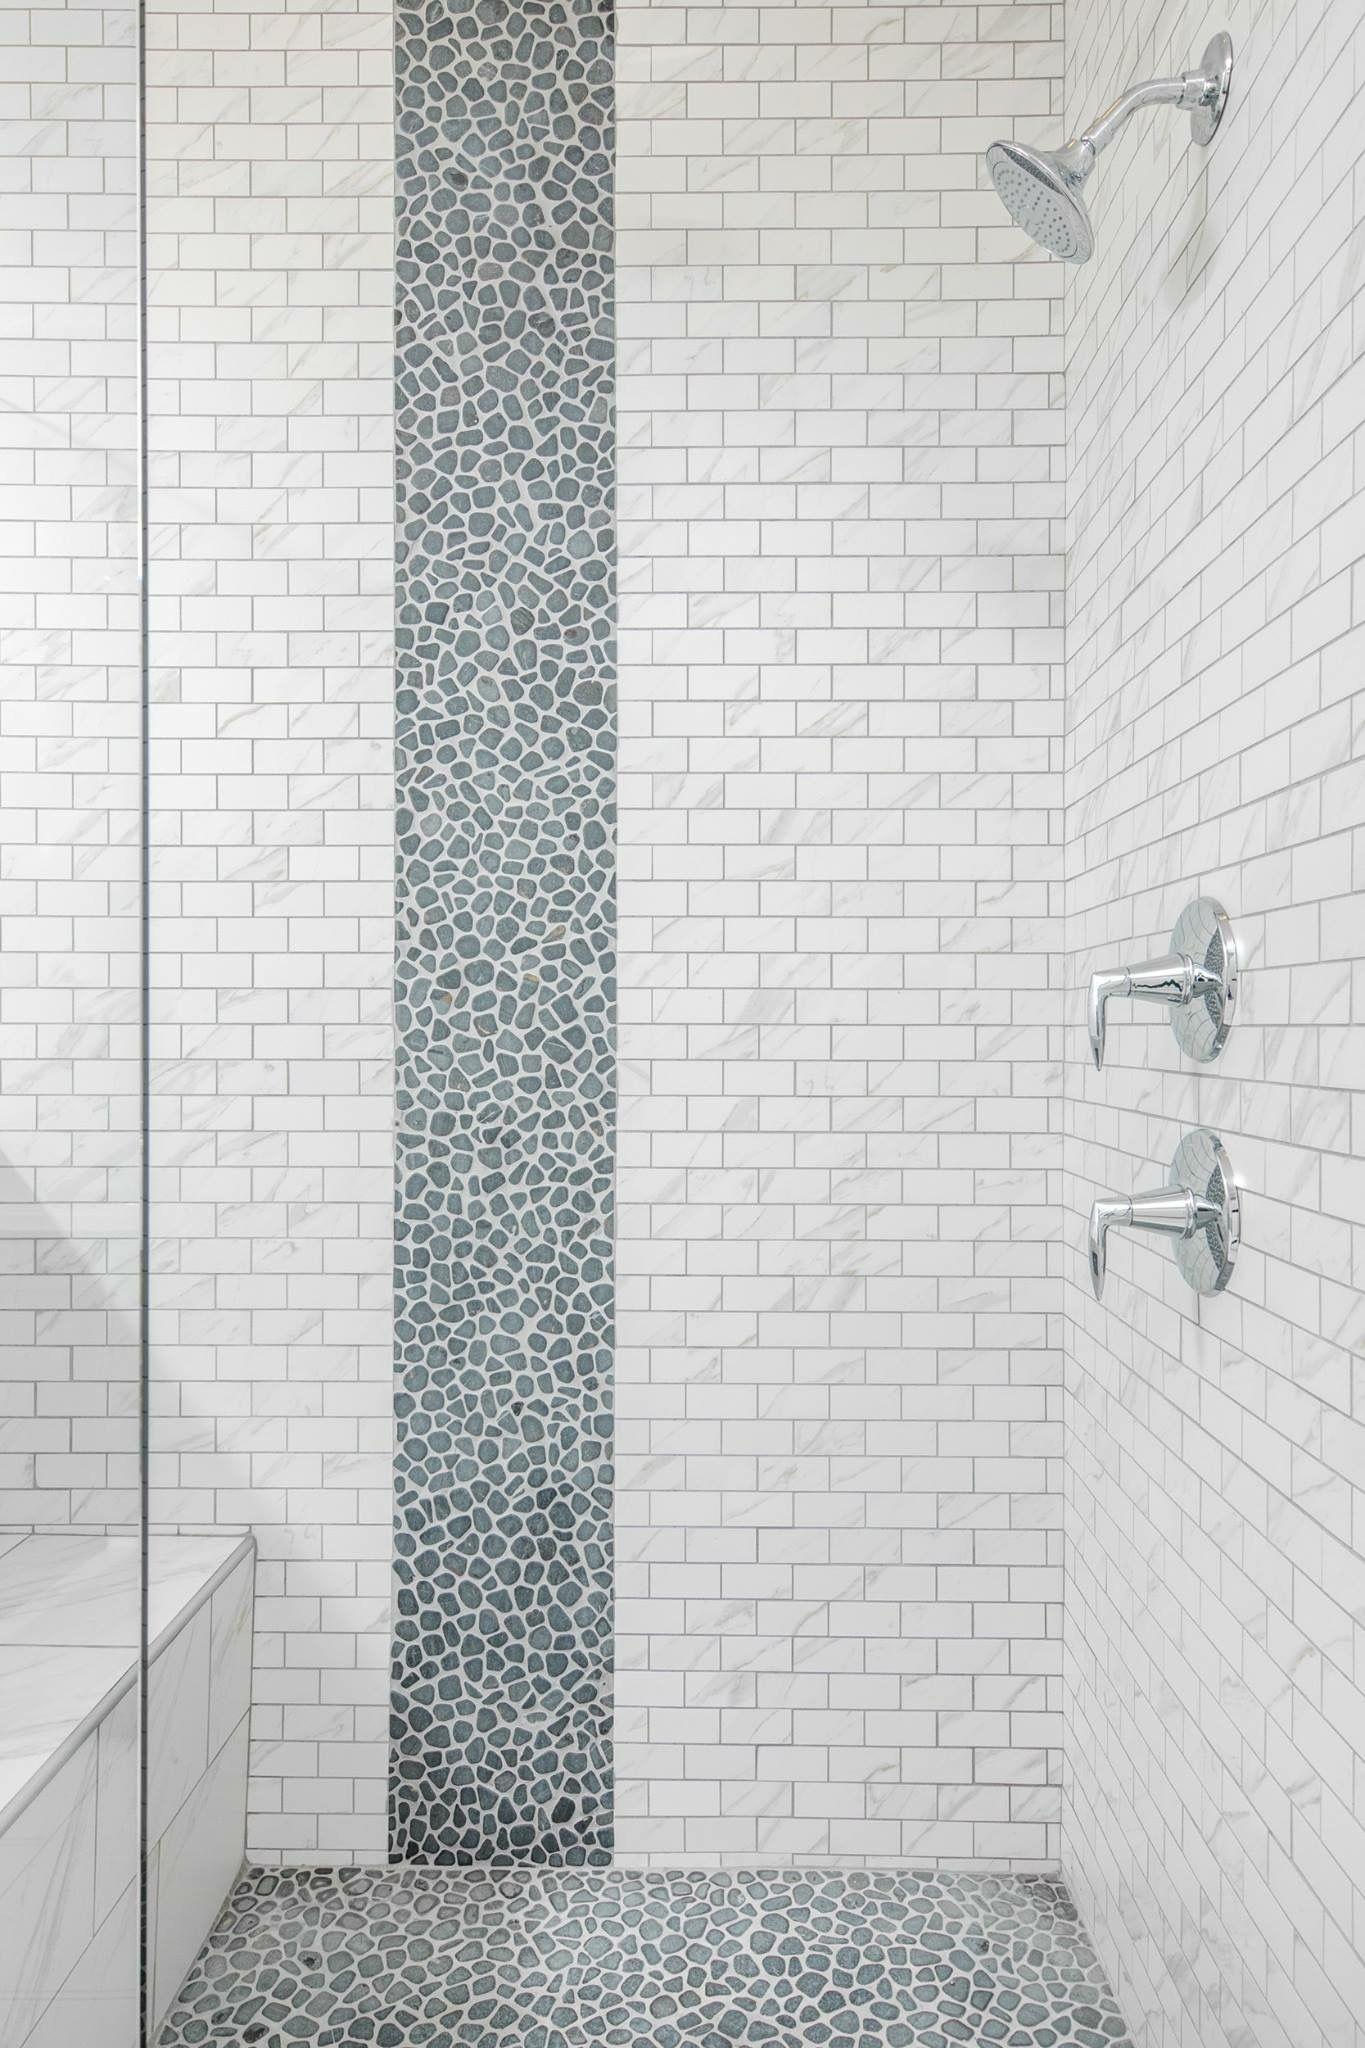 Waterfall Design In Shower Elegant Accents Tile Design Corner Shower Tile Shower Accent Tile Accent Tile Bathroom